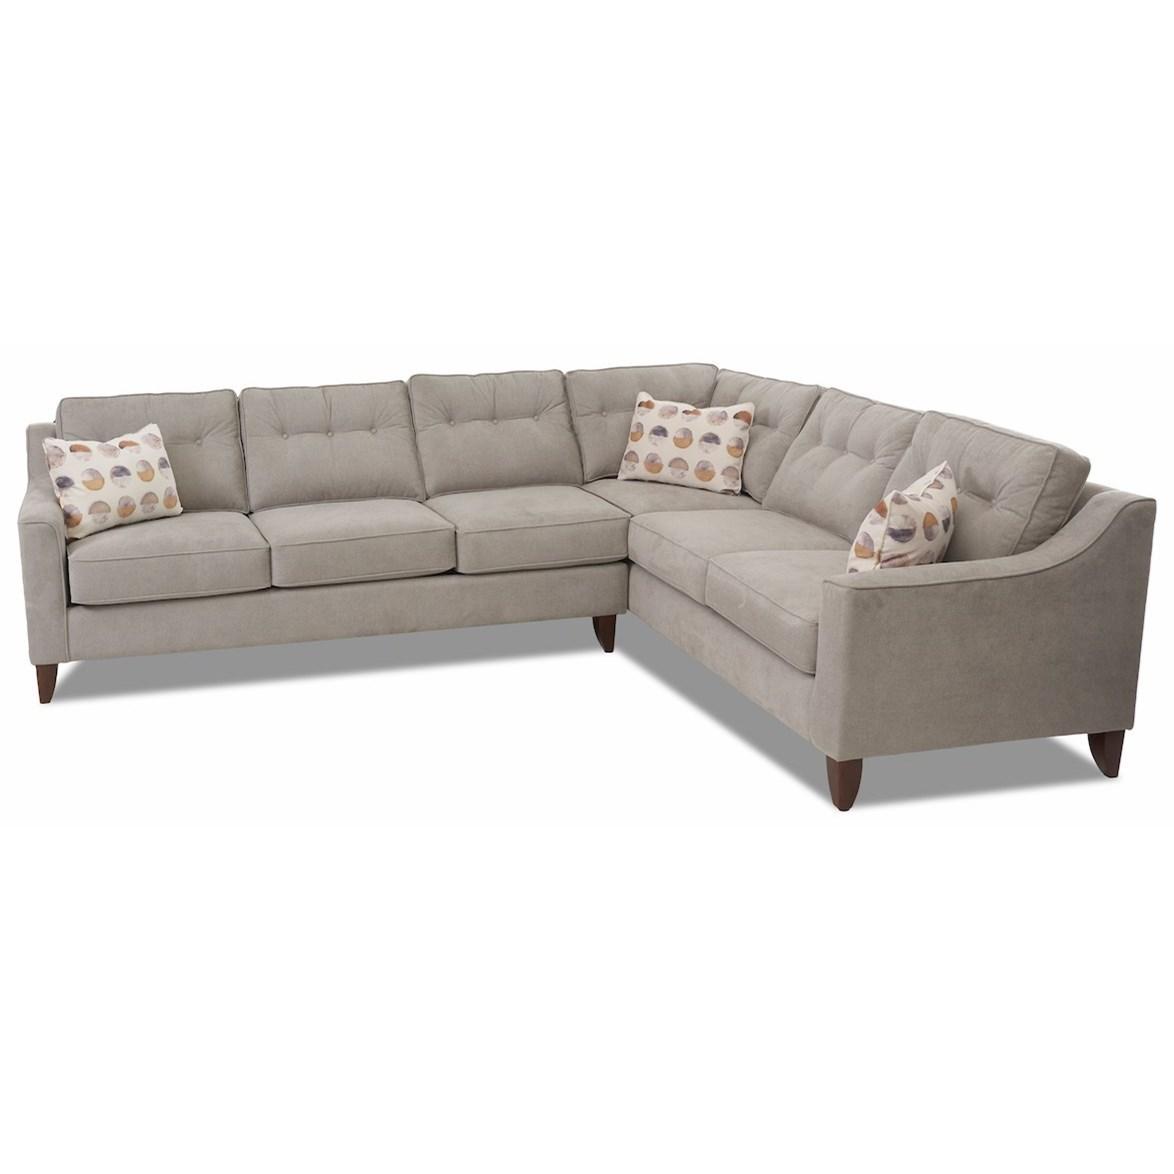 Audrina 2-Piece Sectional Sofa w/ RAF Corner Sofa by Klaussner at Pilgrim Furniture City